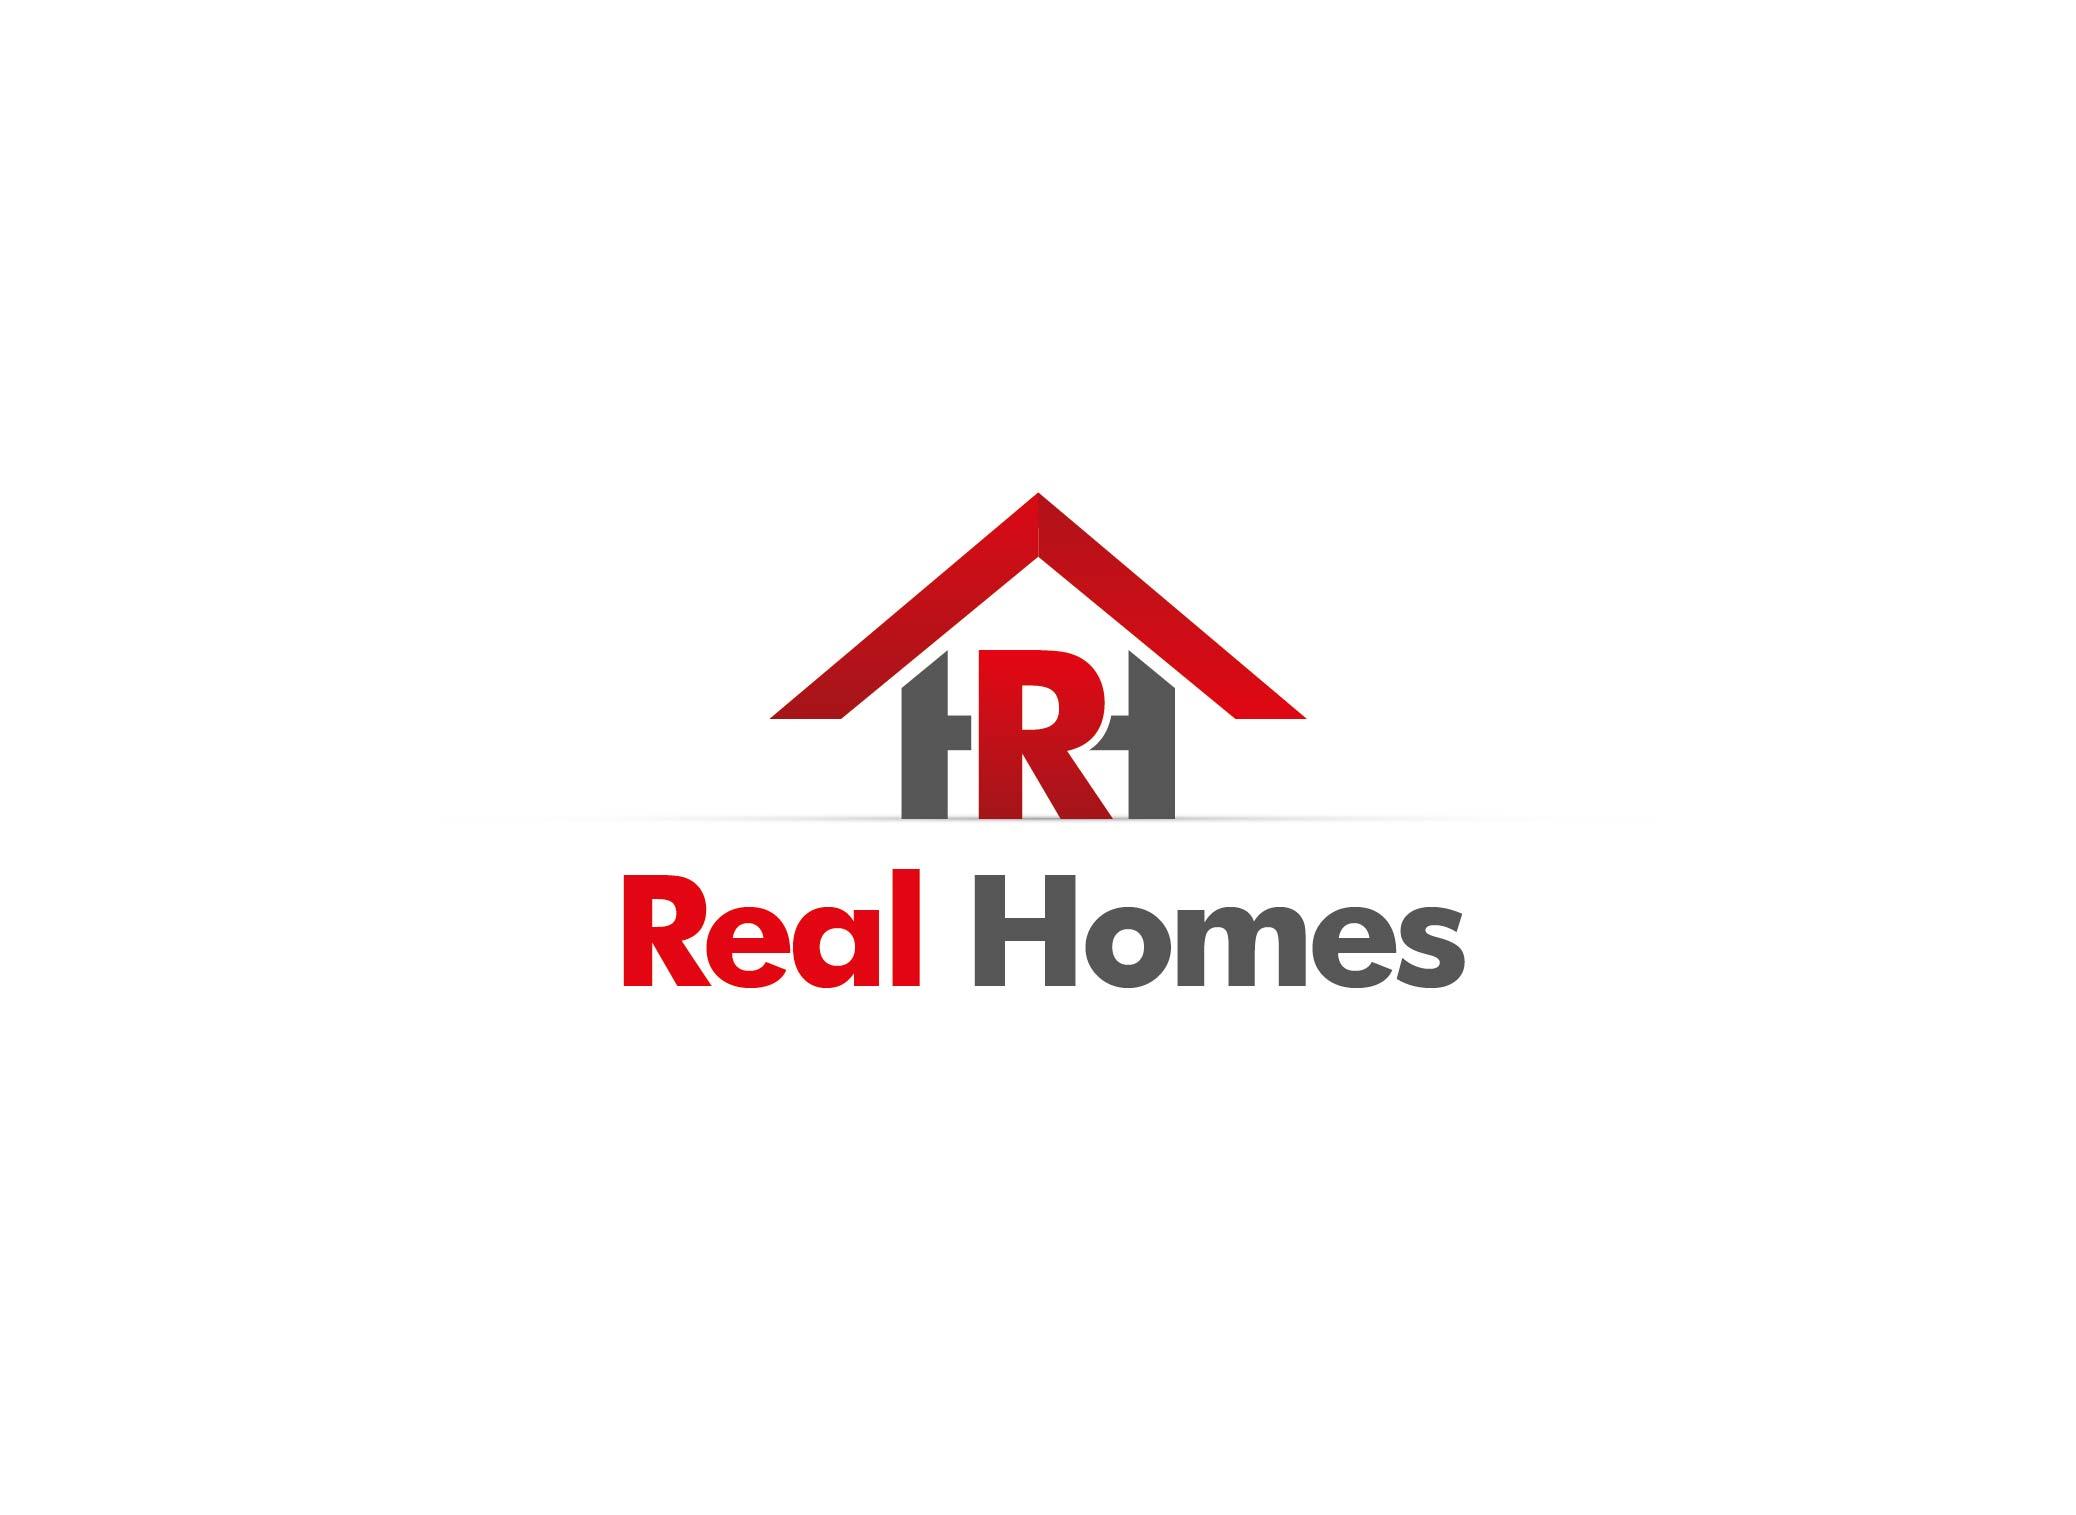 Logo Design by Adnan Taqi - Entry No. 88 in the Logo Design Contest Captivating Logo Design for Real Homes.